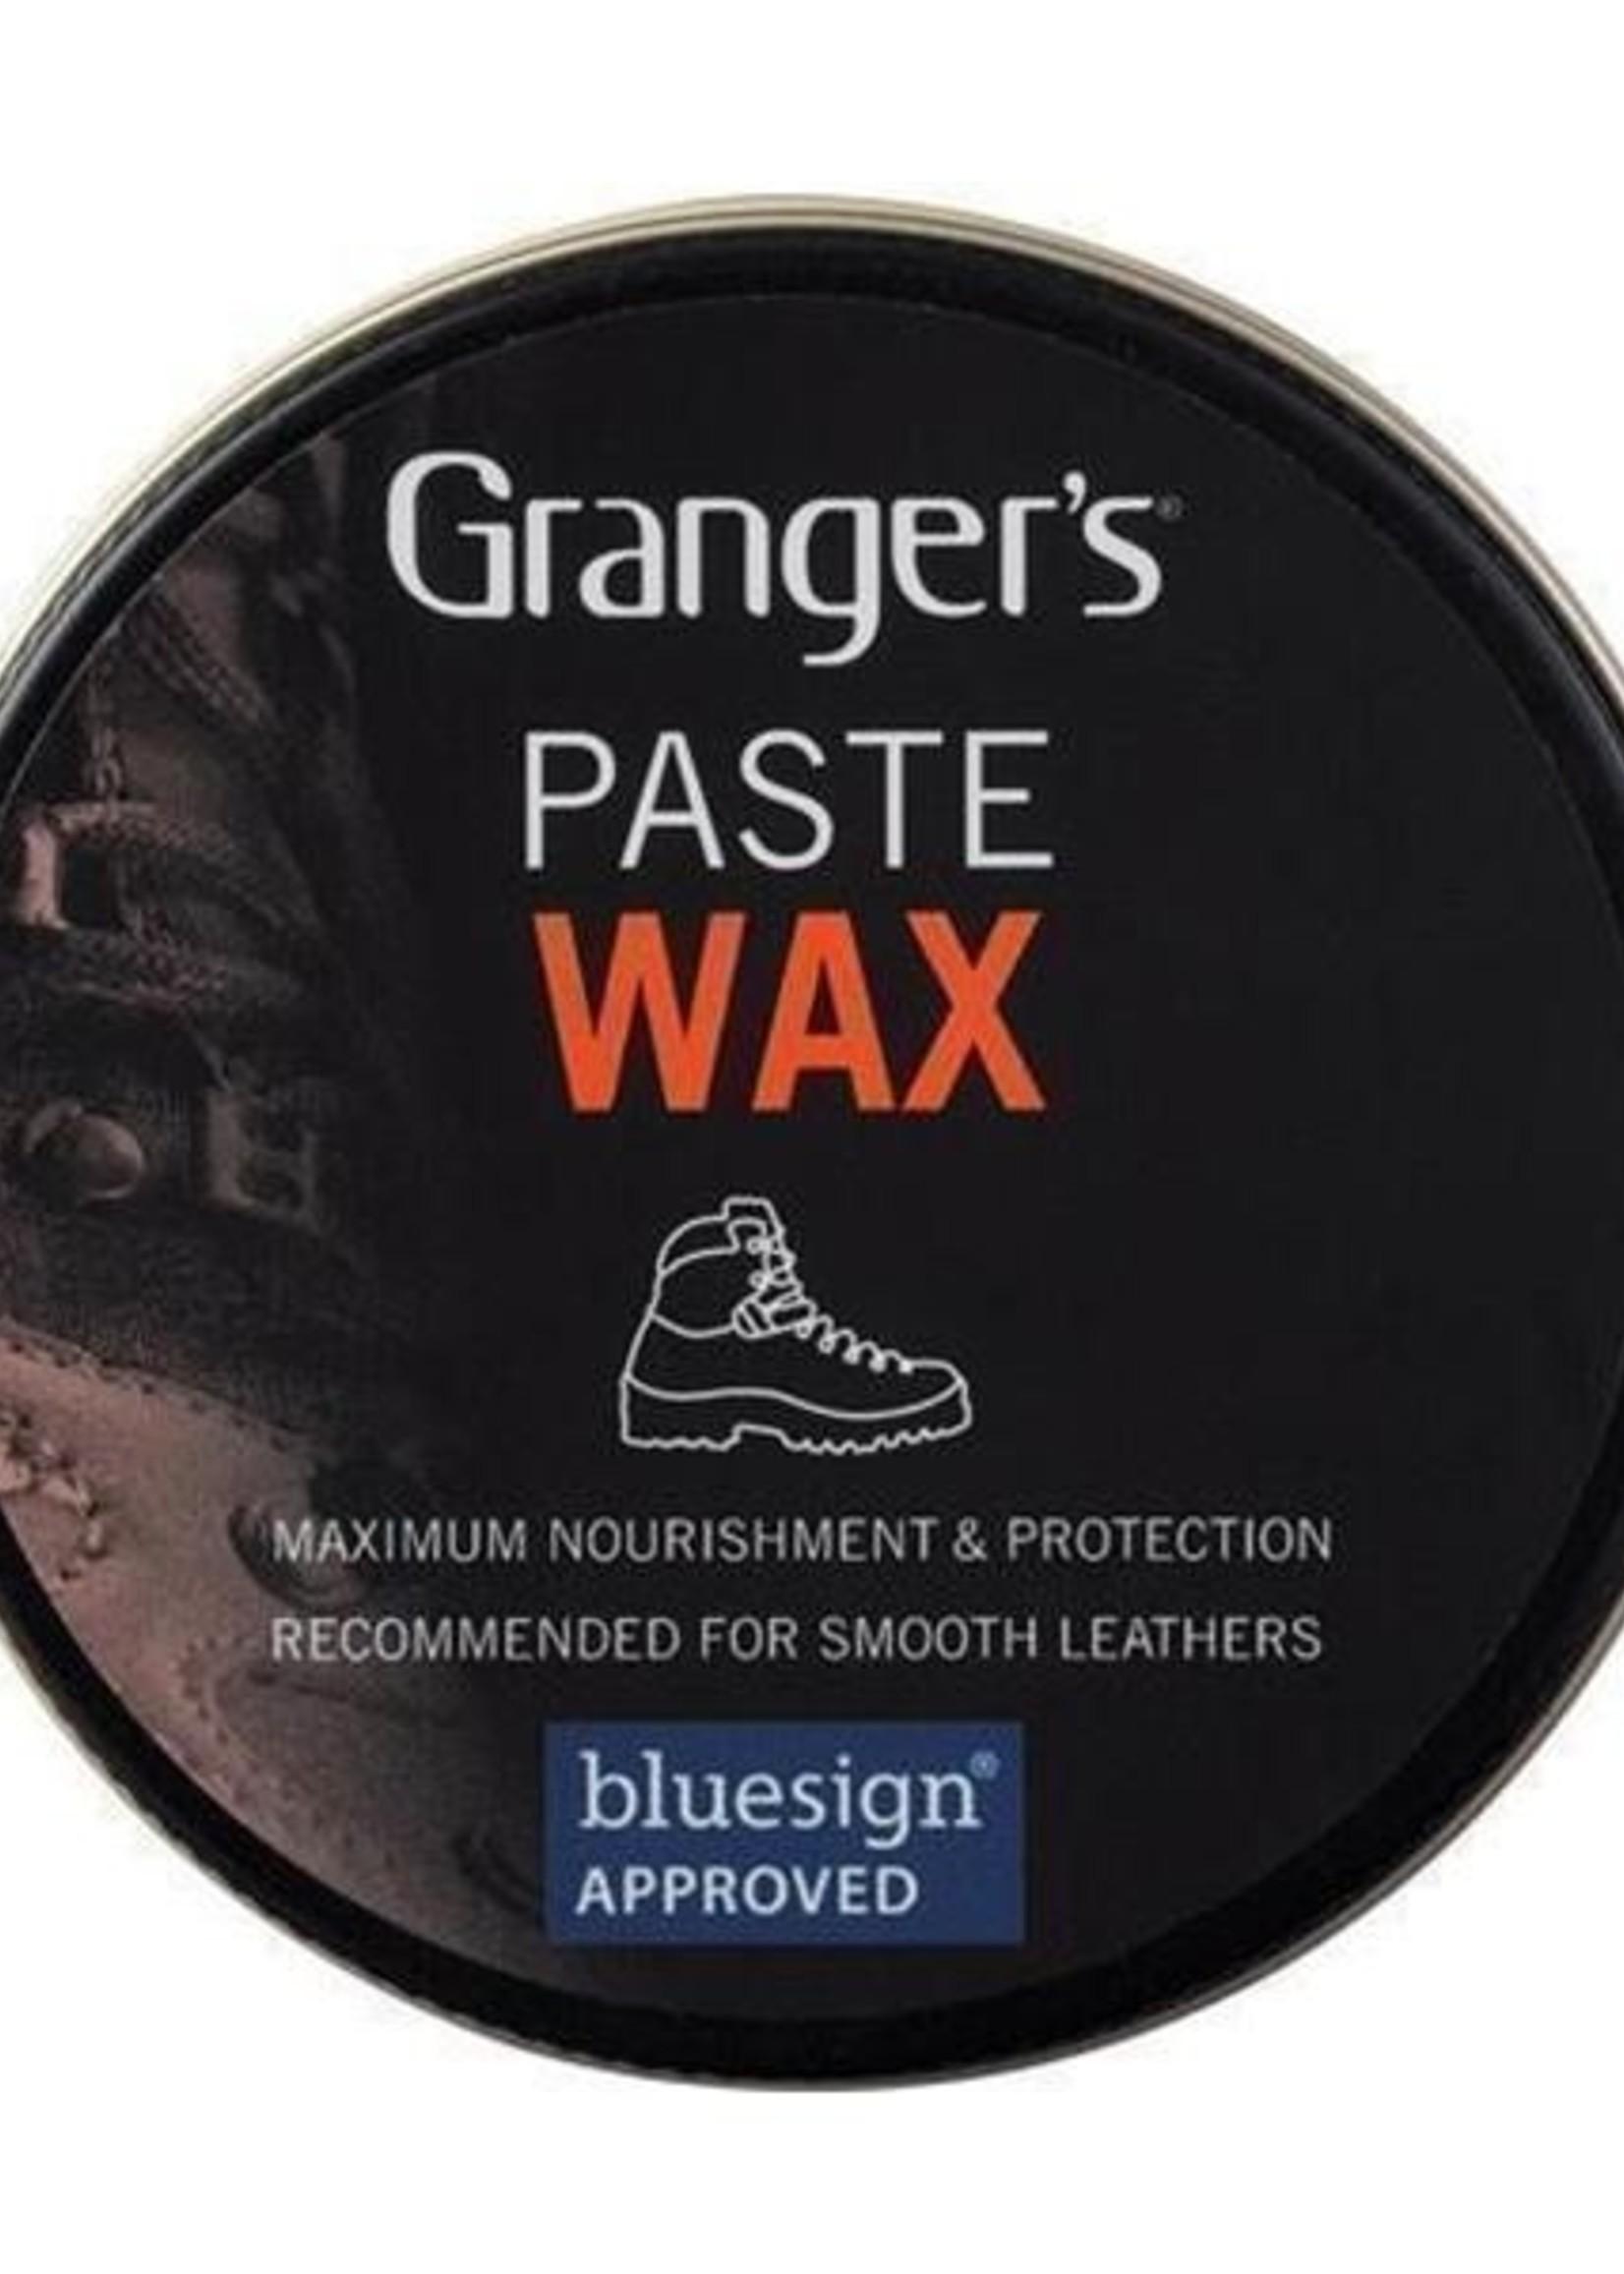 Grangers PASTE WAX G09009